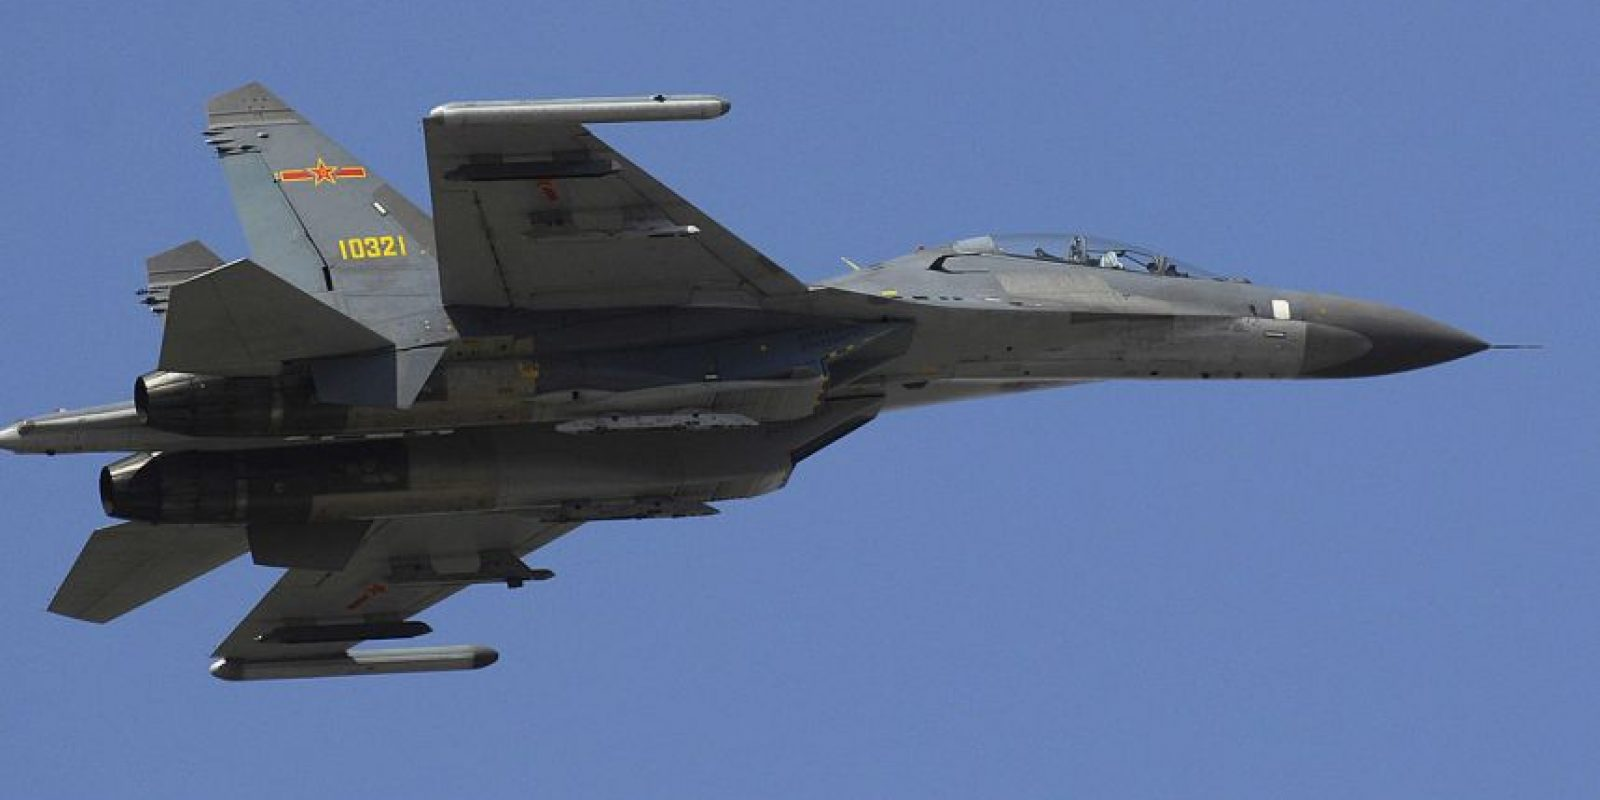 5. Shenyang J-11. Velocidad máxima de Mach 2,35 (2.878,9 km/h) Foto:Wikimedia